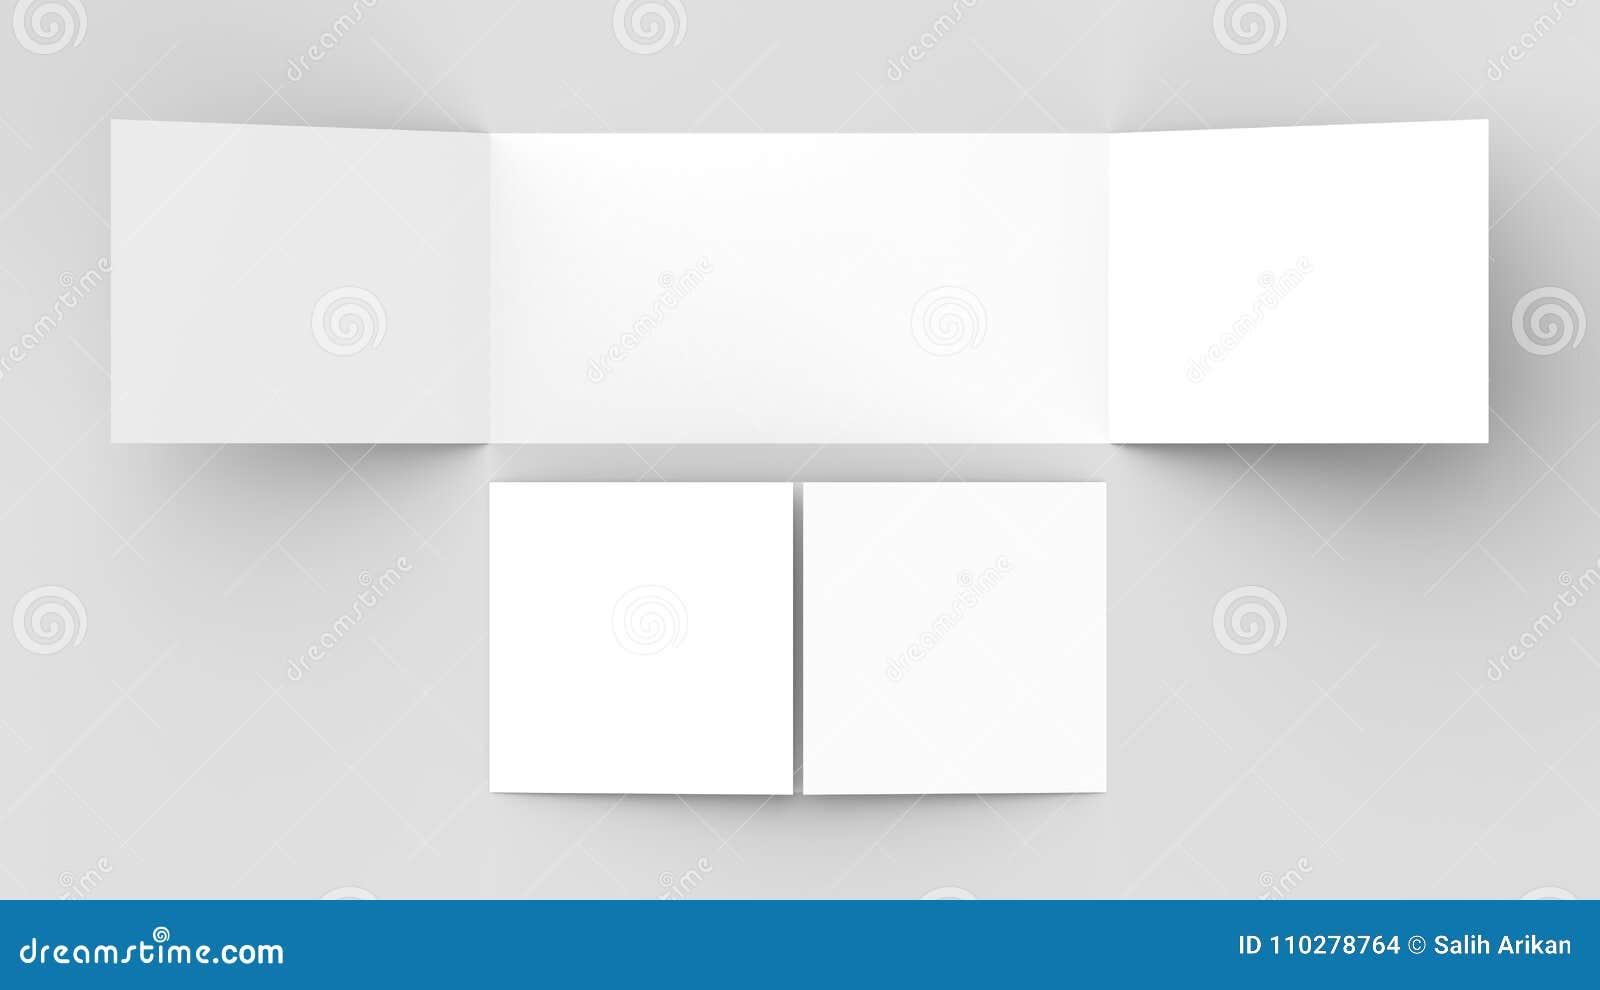 Horizontal - Landscape Gate Fold Brochure Mock Up On So